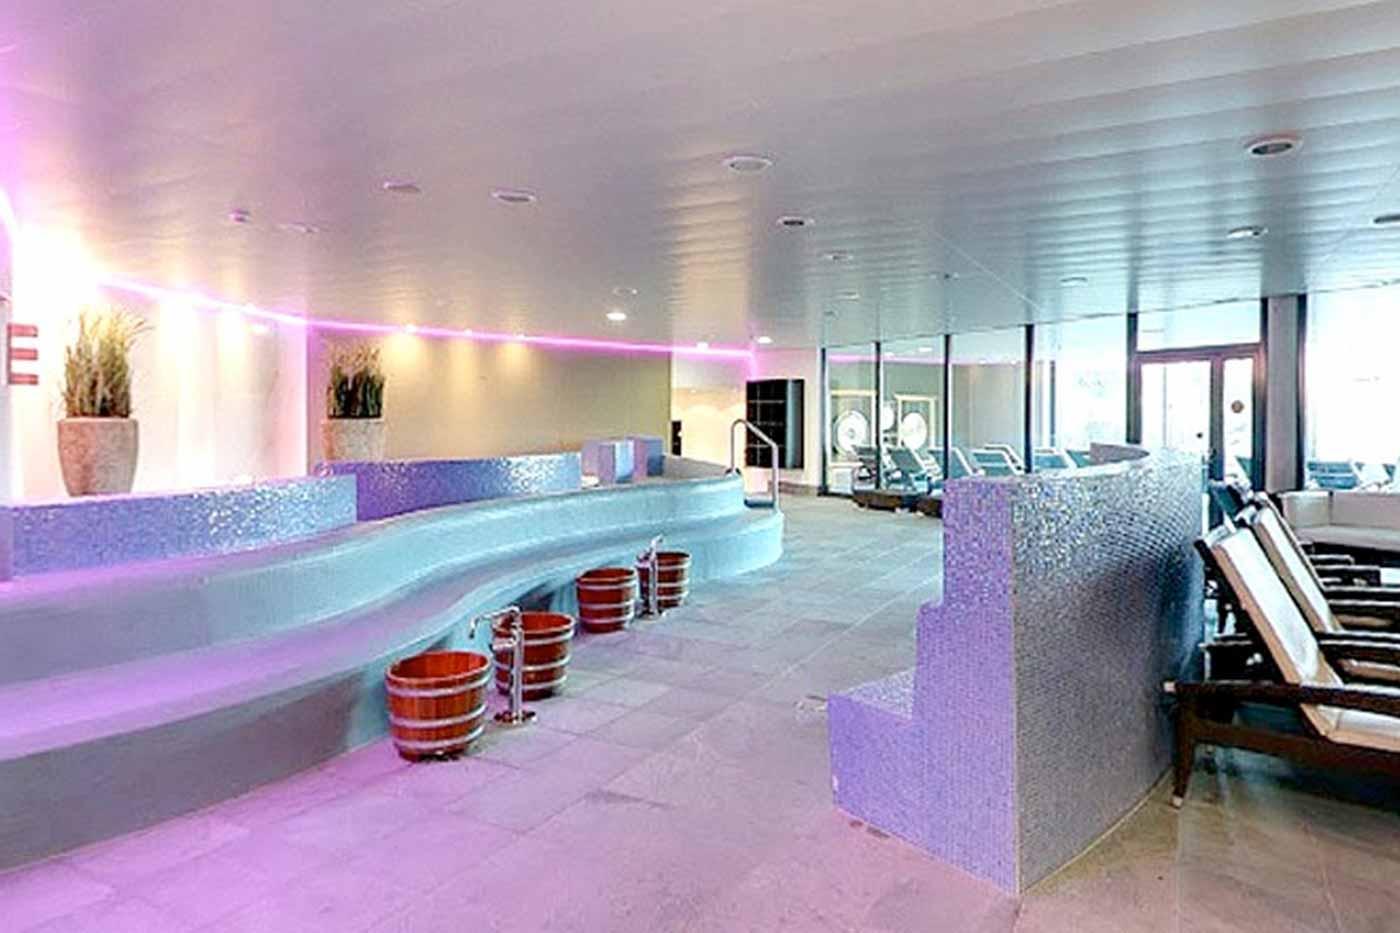 aquabasilea-saunawelt-relaxpools-02